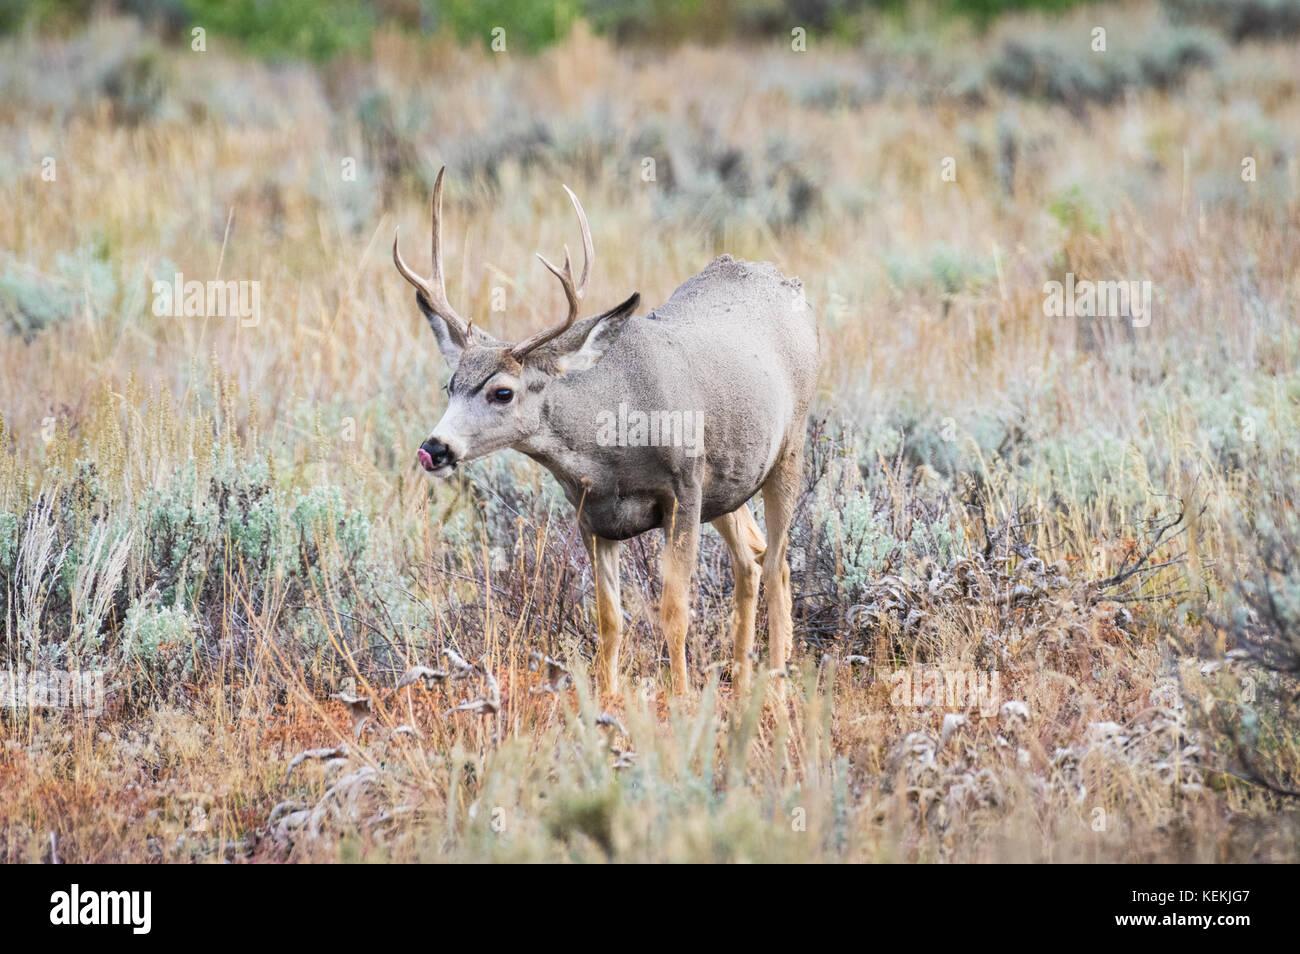 Profile view of a single antlered mule deer buck. - Stock Image